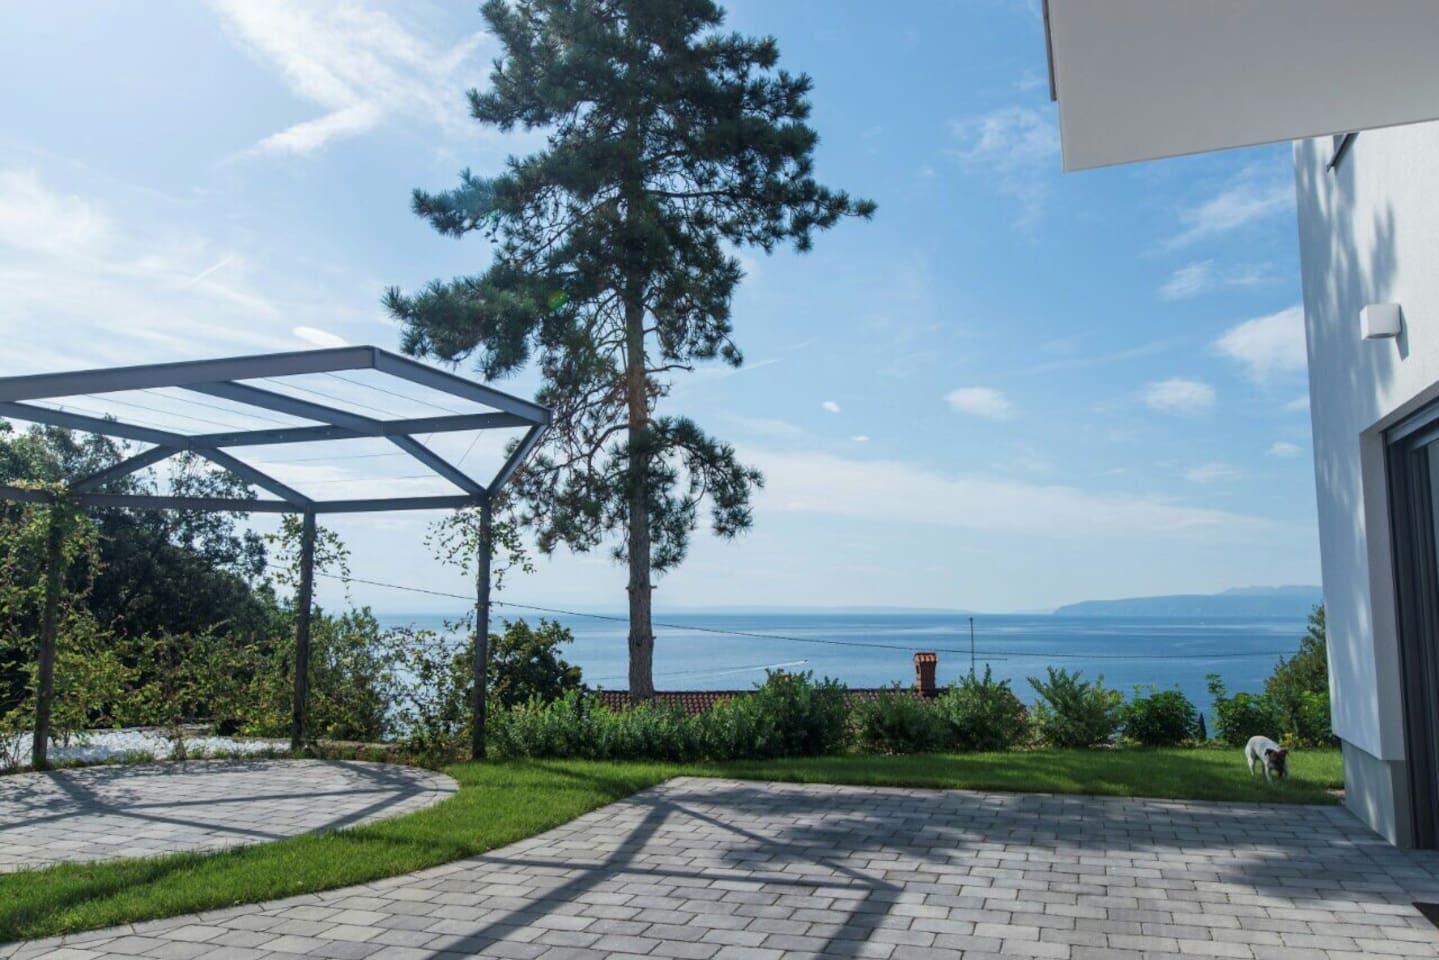 Kvarner bay view